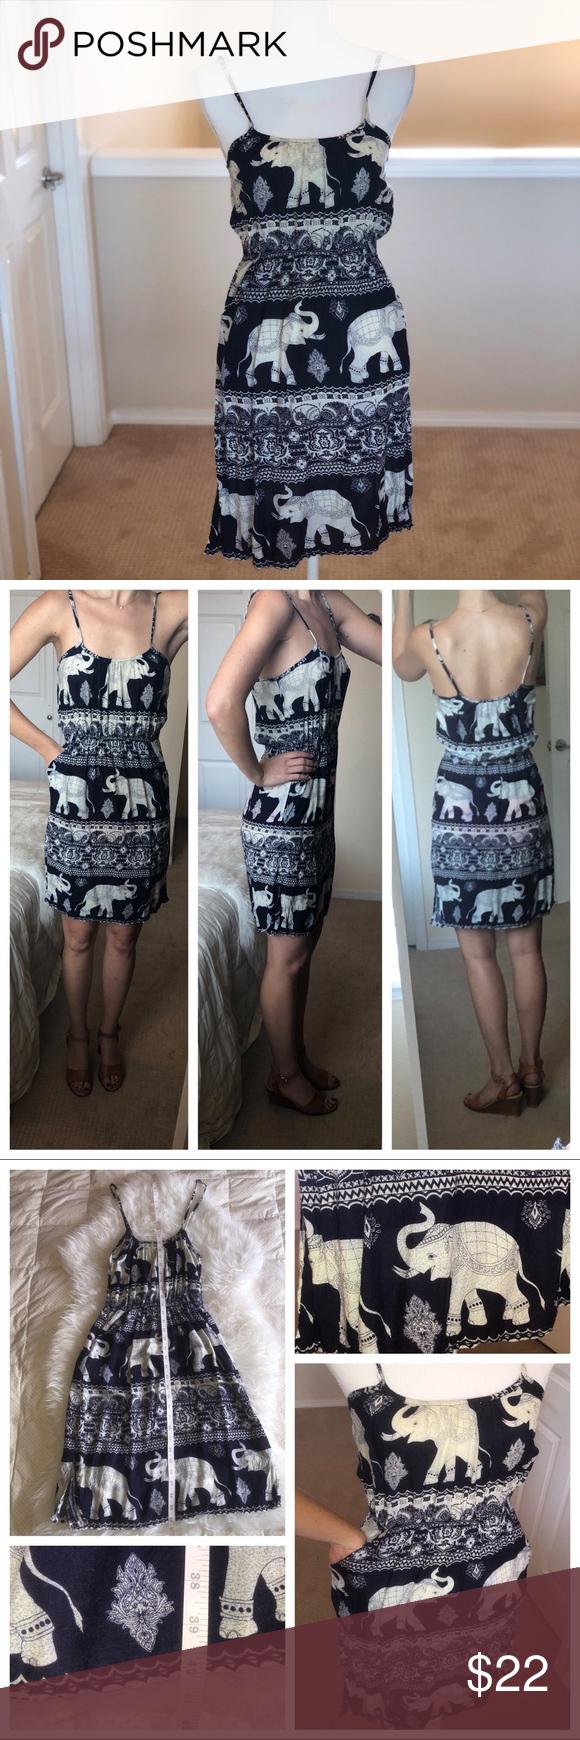 Elephant Print Dress From Thailand Size Medium Elephant Print Dress Elephant Print Clothes Design